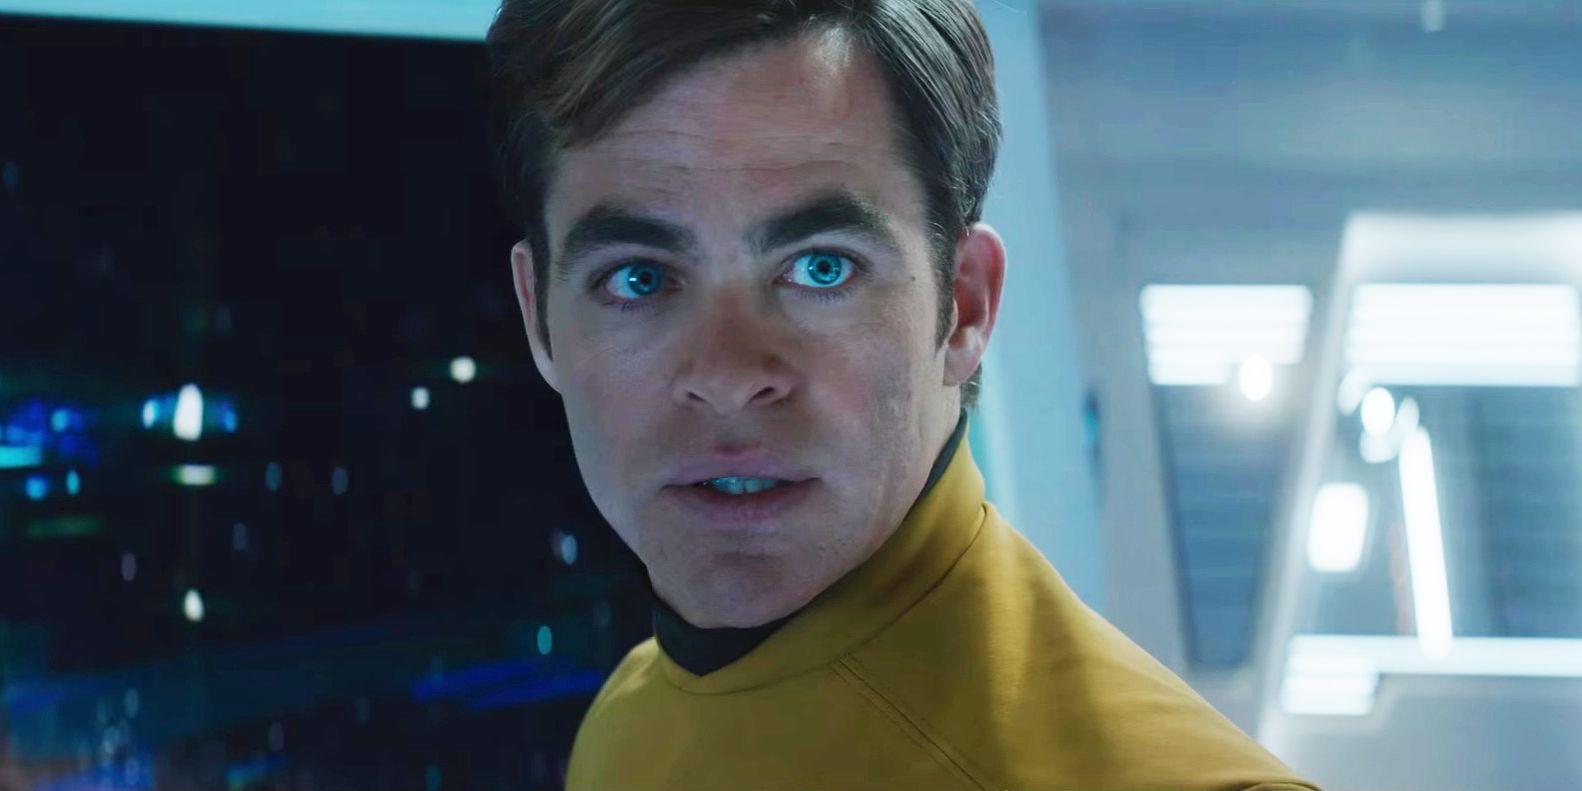 Star Trek Beyond Chris Pine as Kirk